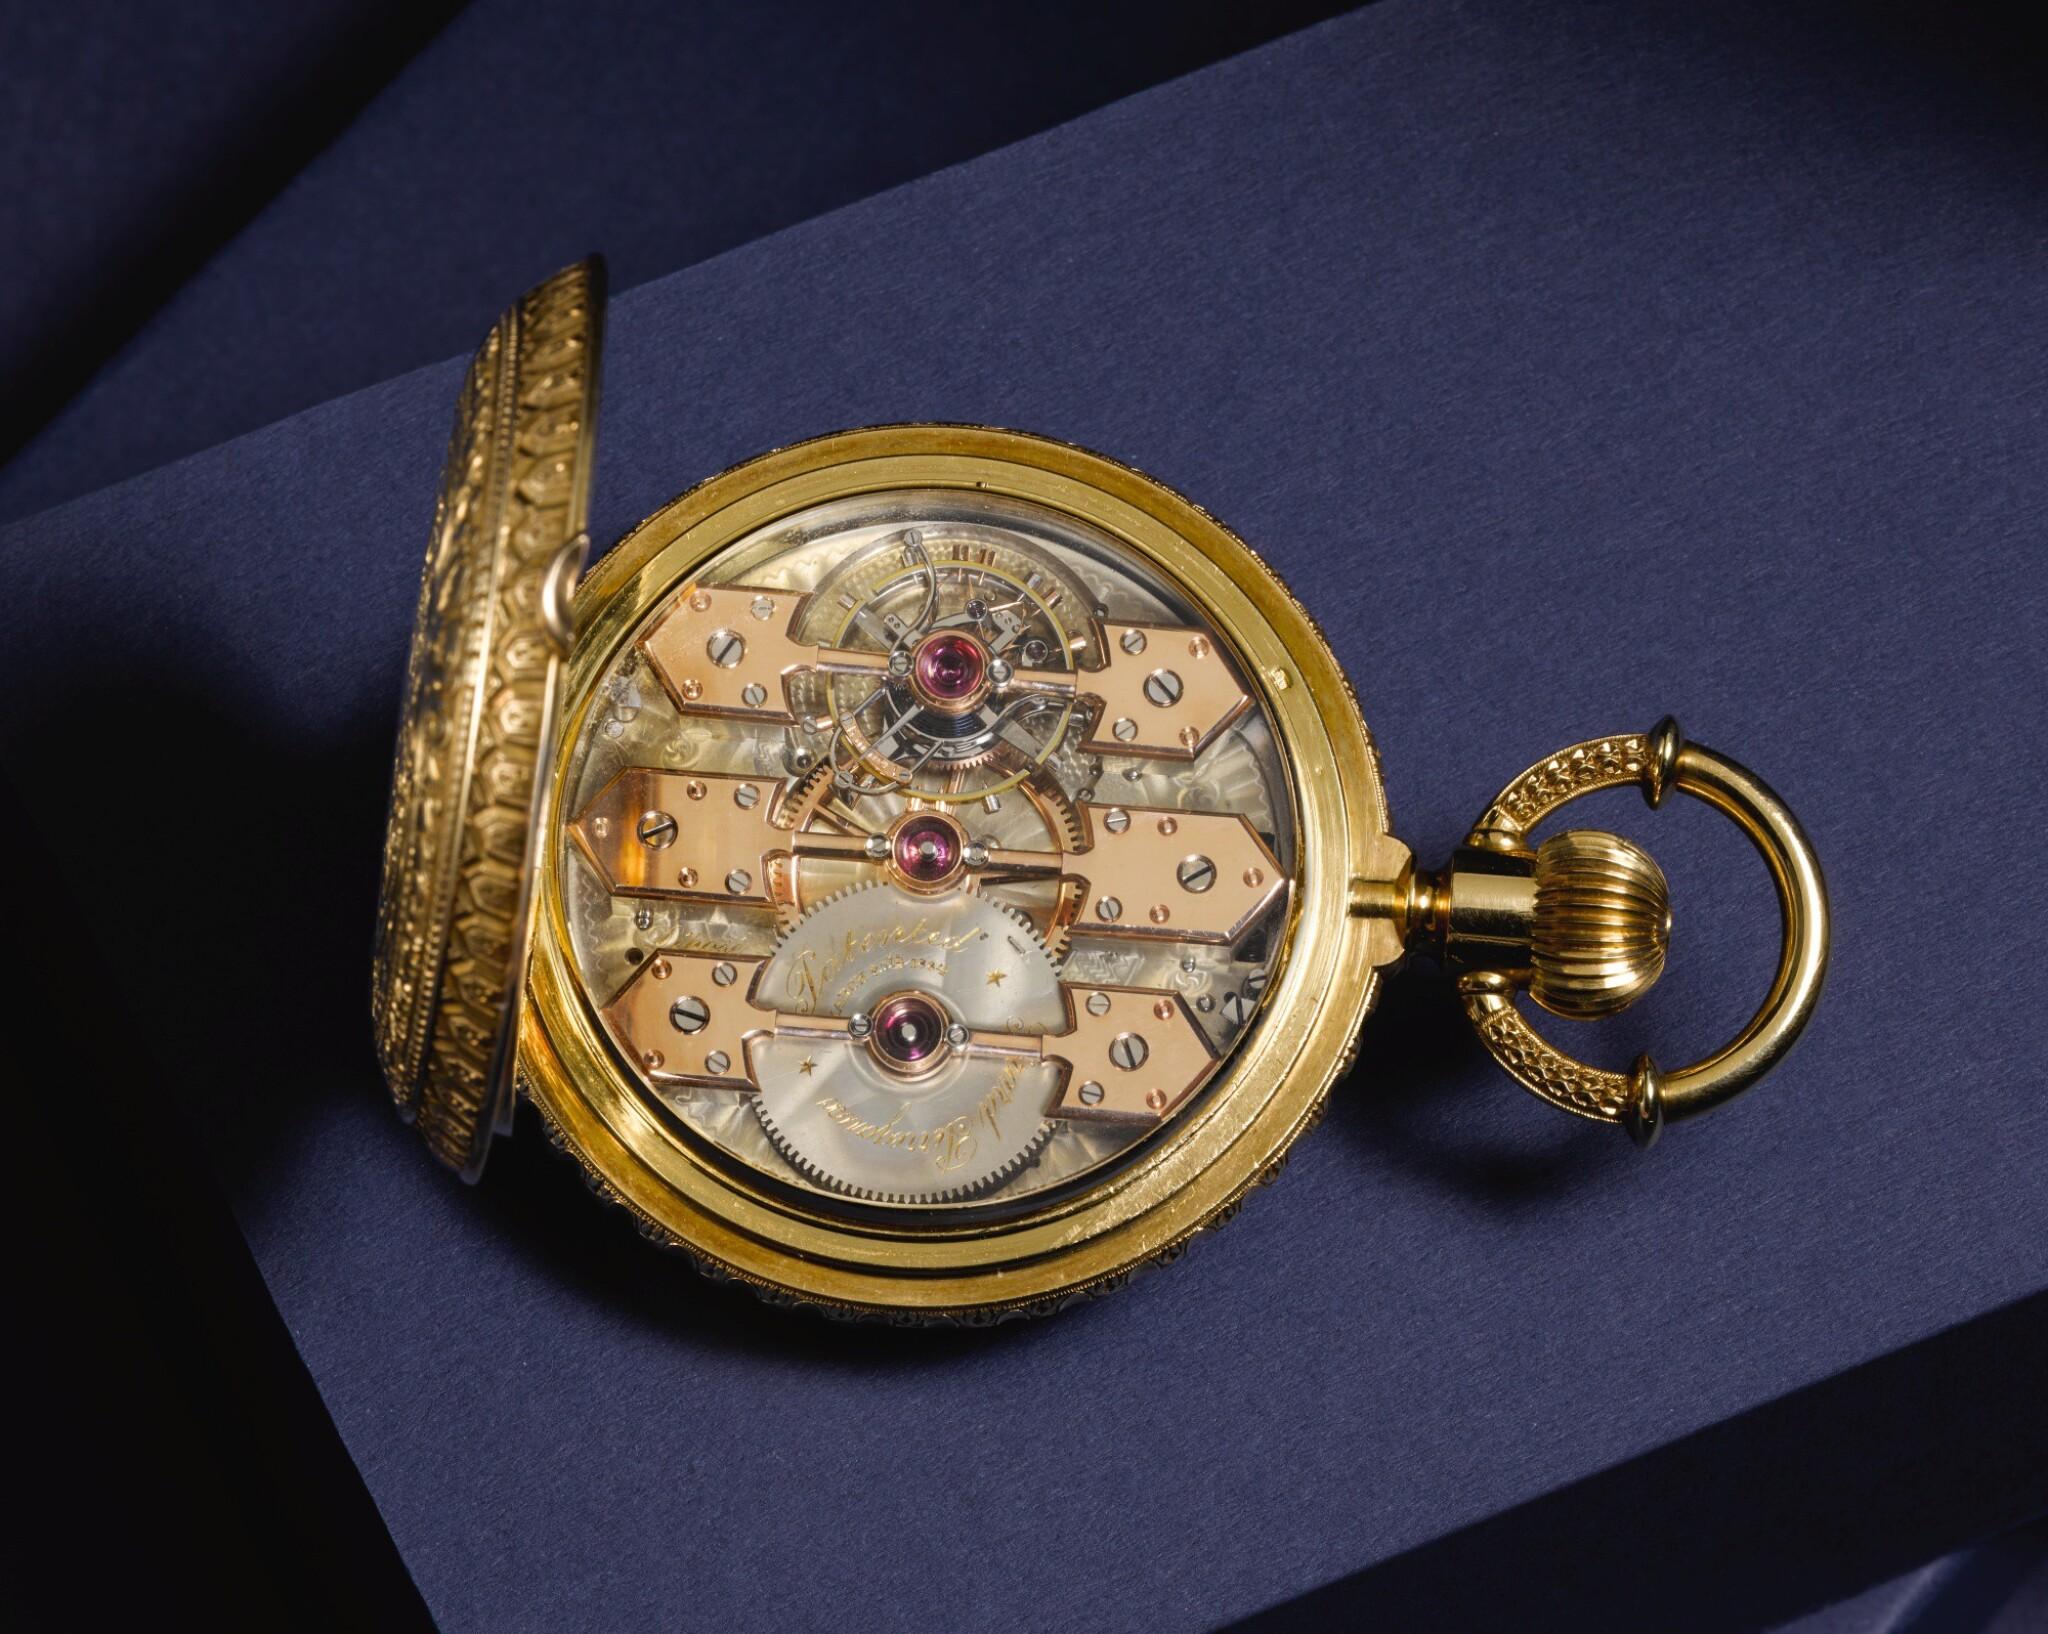 View full screen - View 1 of Lot 92. GIRARD-PERREGAUX, CHAUX-DE-FONDS [芝柏,拉紹德封] | A RARE AND HEAVY GOLD HUNTING CASED KEYLESS ONE-MINUTE TOURBILLON WATCH WITH PIVOTED DETENT CHRONOMETER ESCAPEMENT,  CIRCA 1890, THREE BRIDGE TOURBILLON [罕有黃金一分鐘陀飛輪懷錶備天文鐘擒縱系統,年份約1890,三橋陀飛輪].